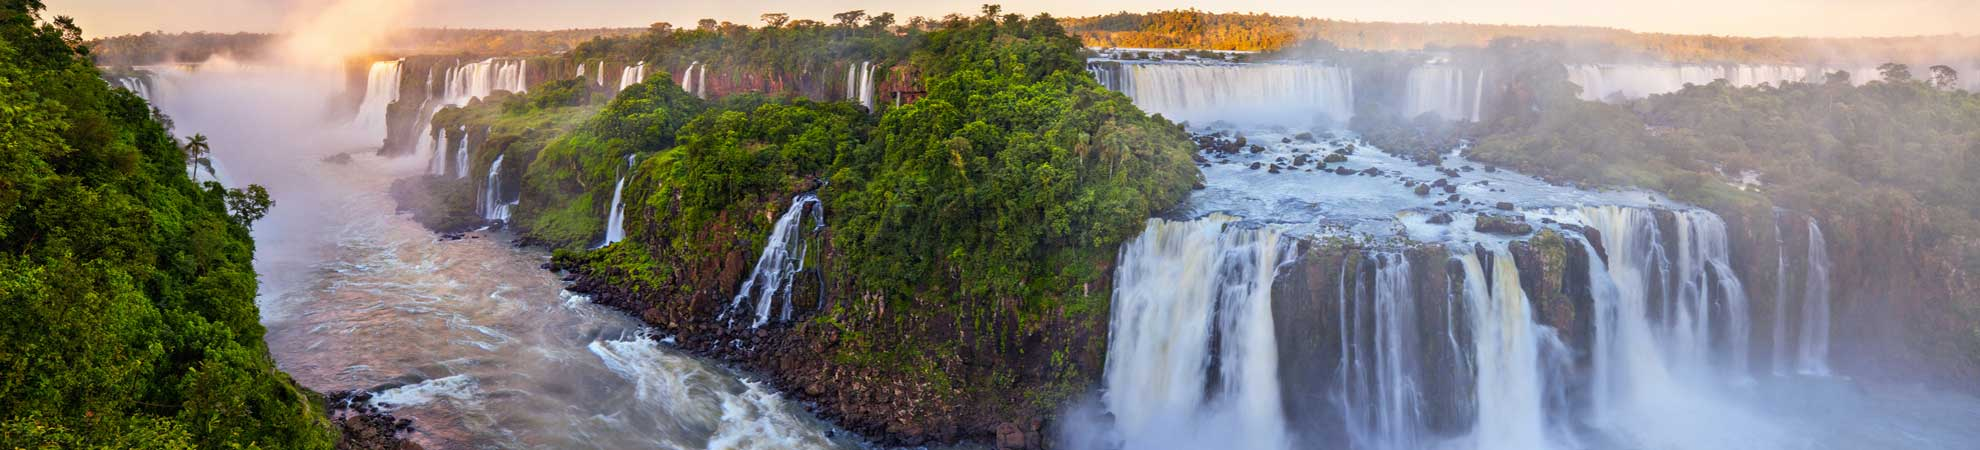 Voyage chutes d'Iguazu